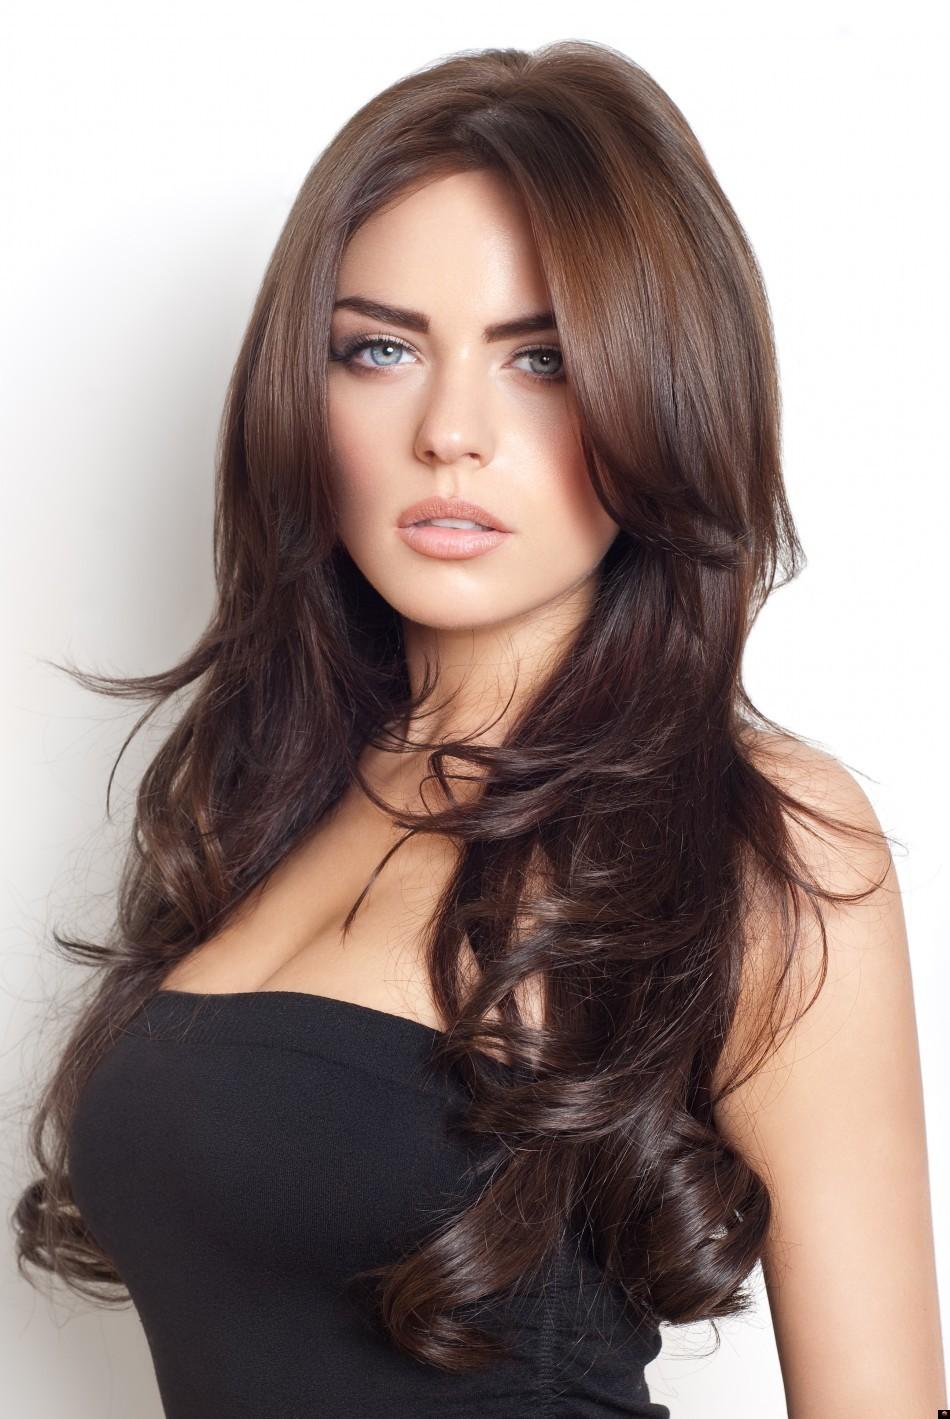 Please Help Me Id This Models Model Id Bellazon